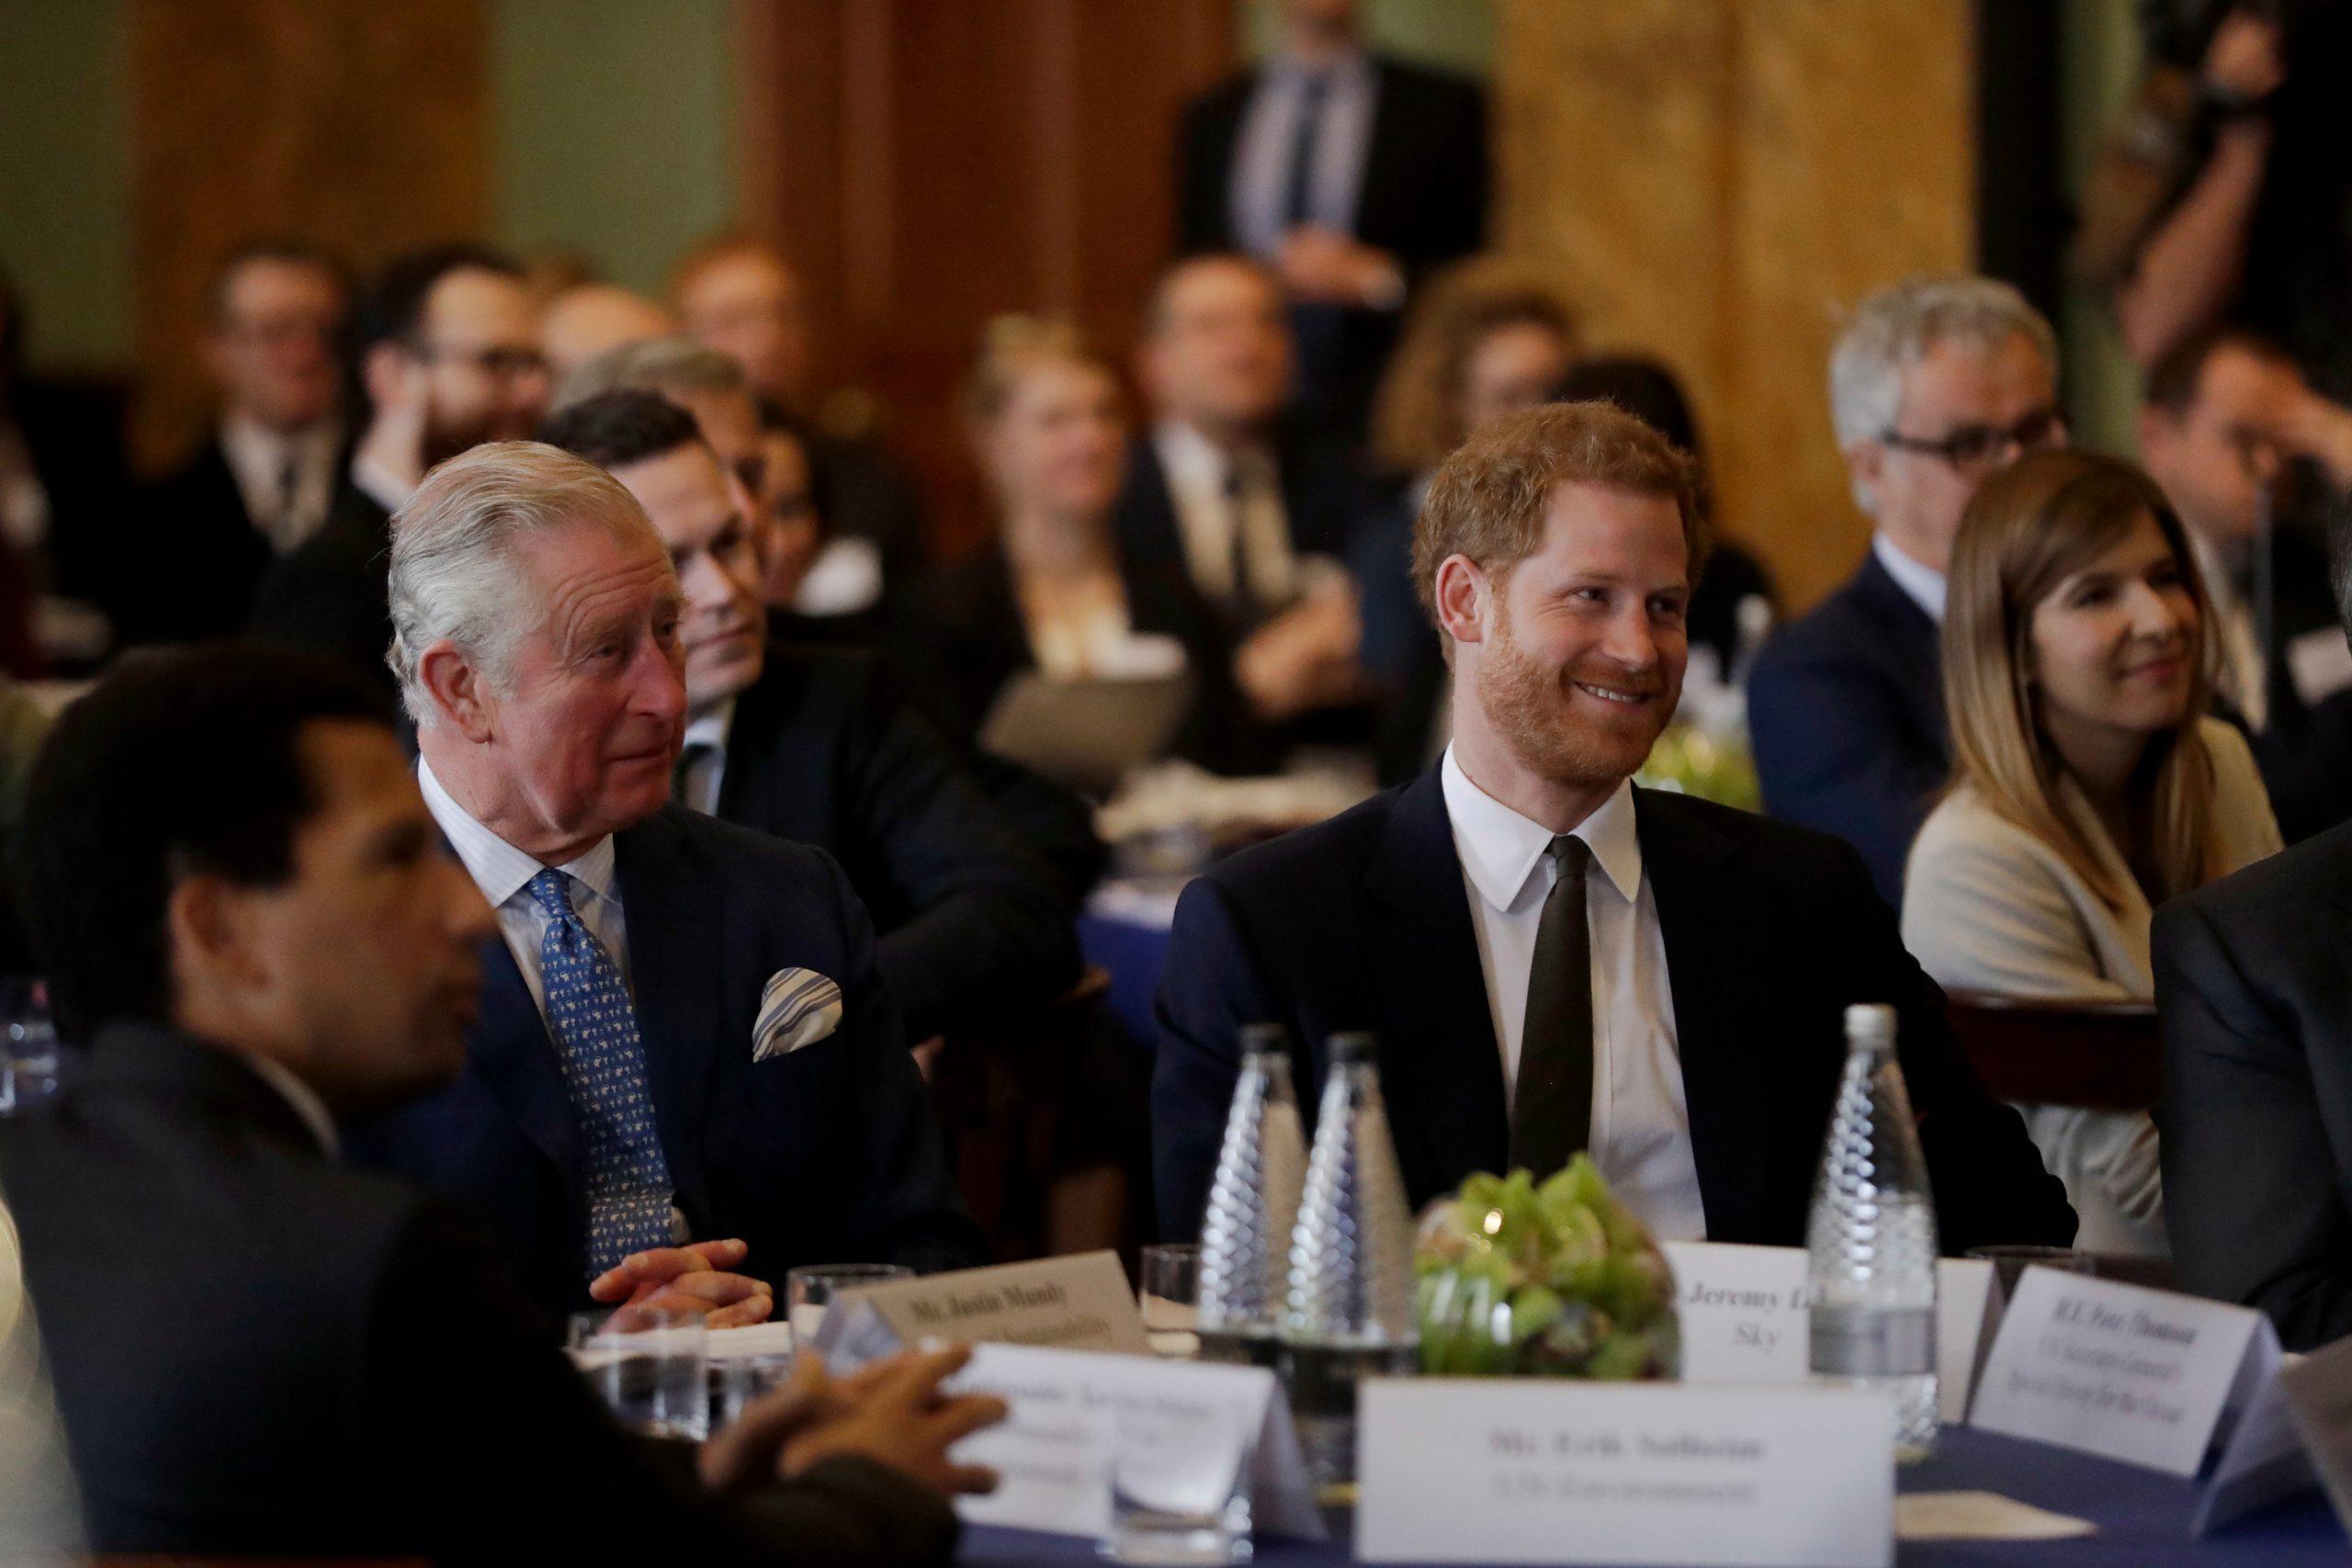 Britain Royals, London, United Kingdom - 14 Feb 2018